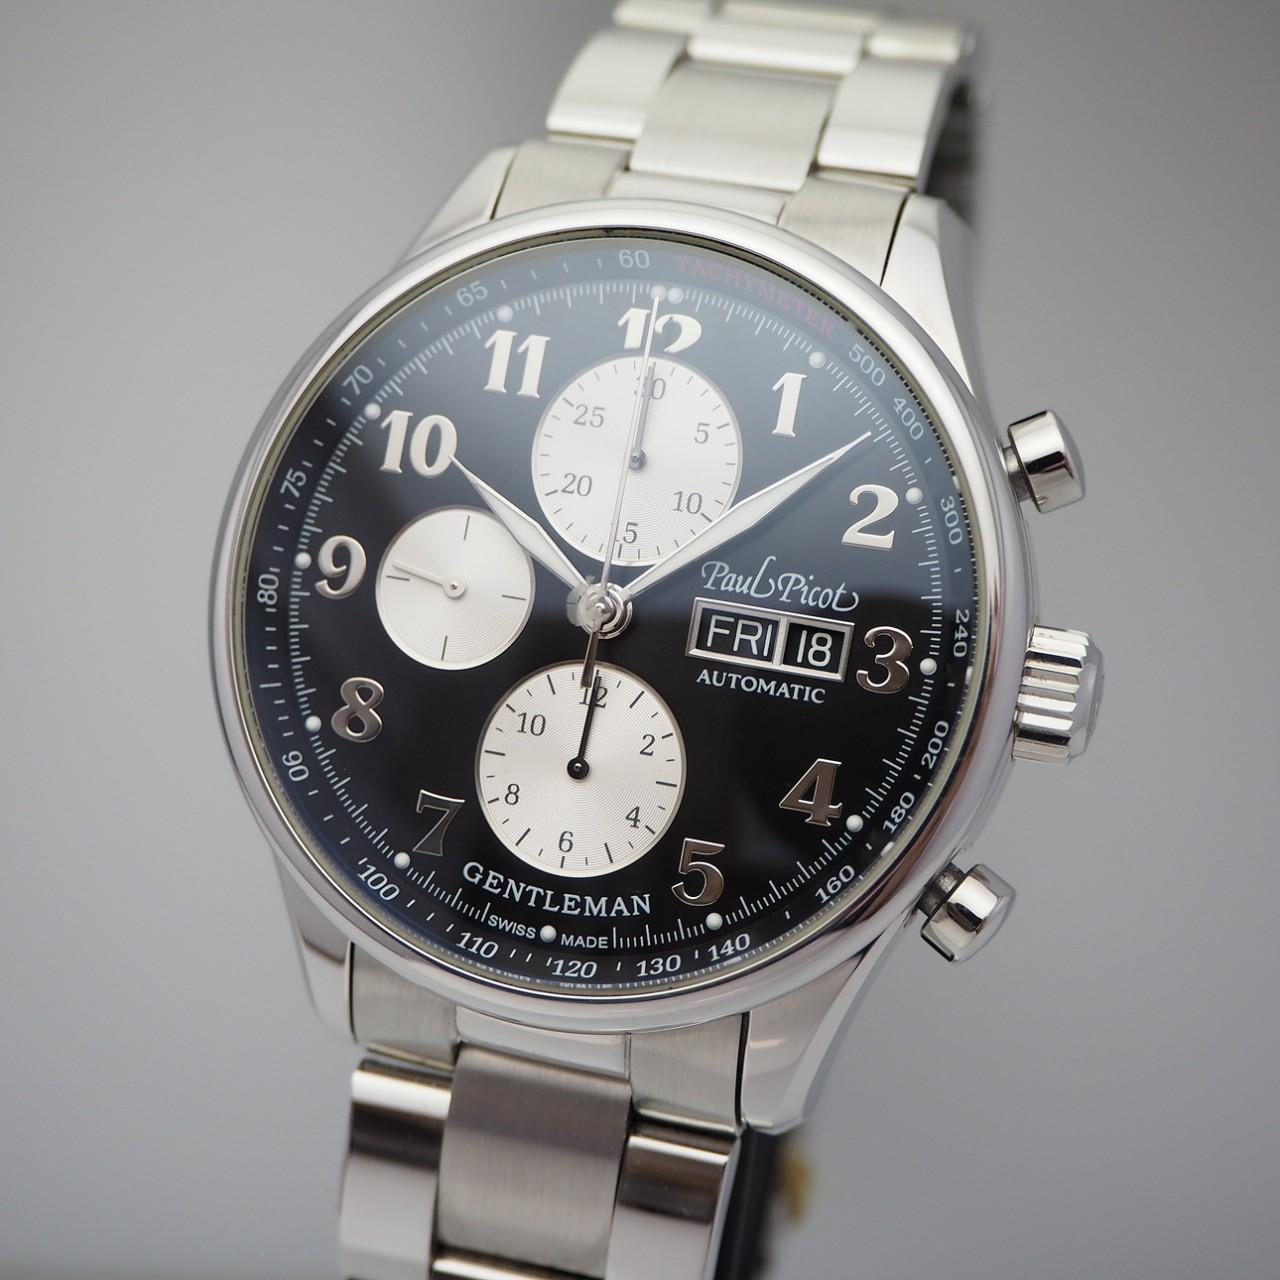 Paul Picot Gentleman Chronograph Stahl/ Stahl 2021 NEU, B & P